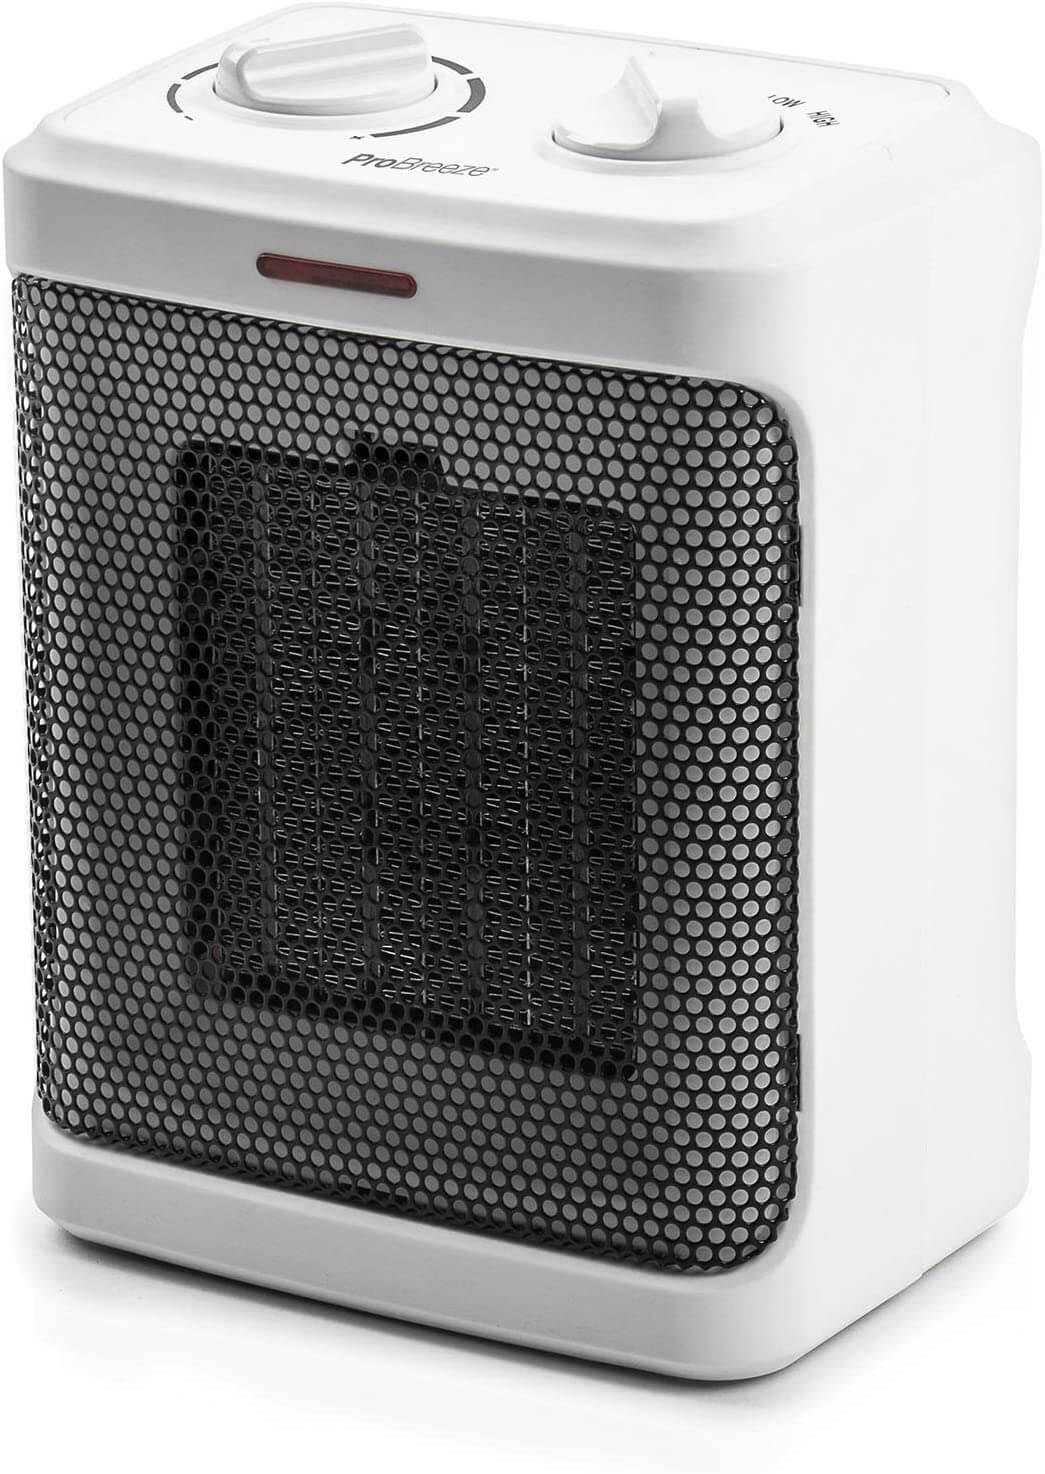 Pro Breeze Space Heater